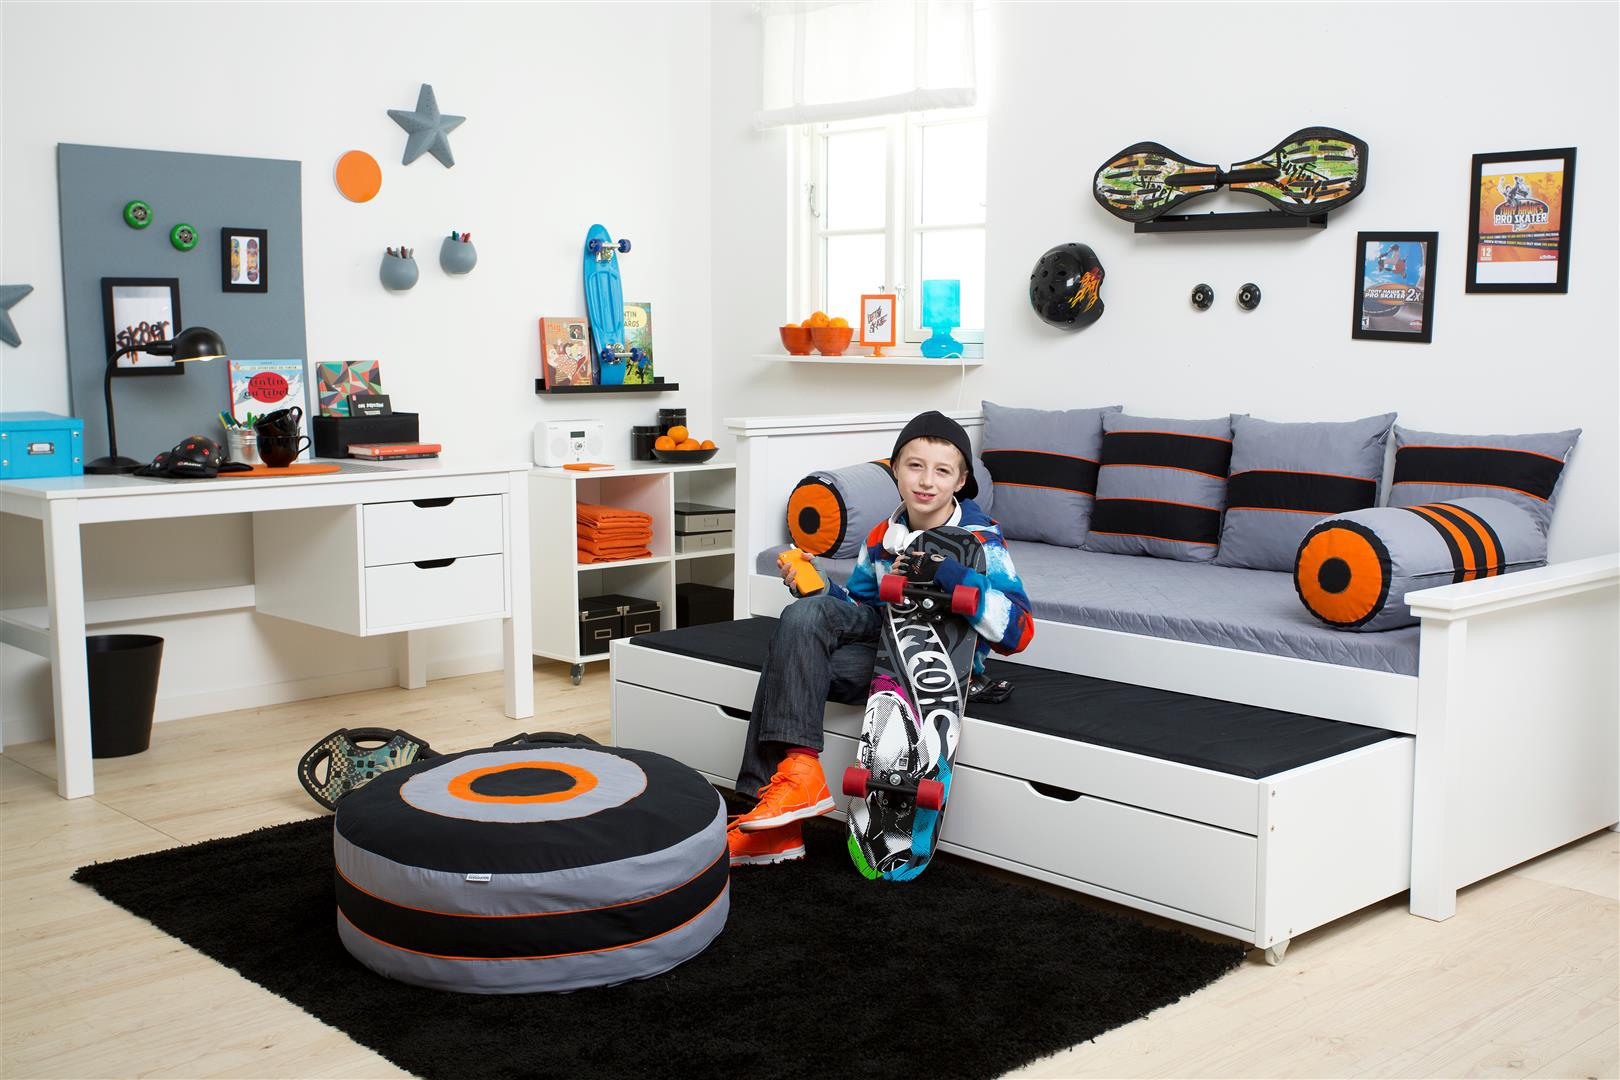 Lit banquette gigogne PERSONNALISABLE Skater couchage 90x200 cm- HOPPEKIDS